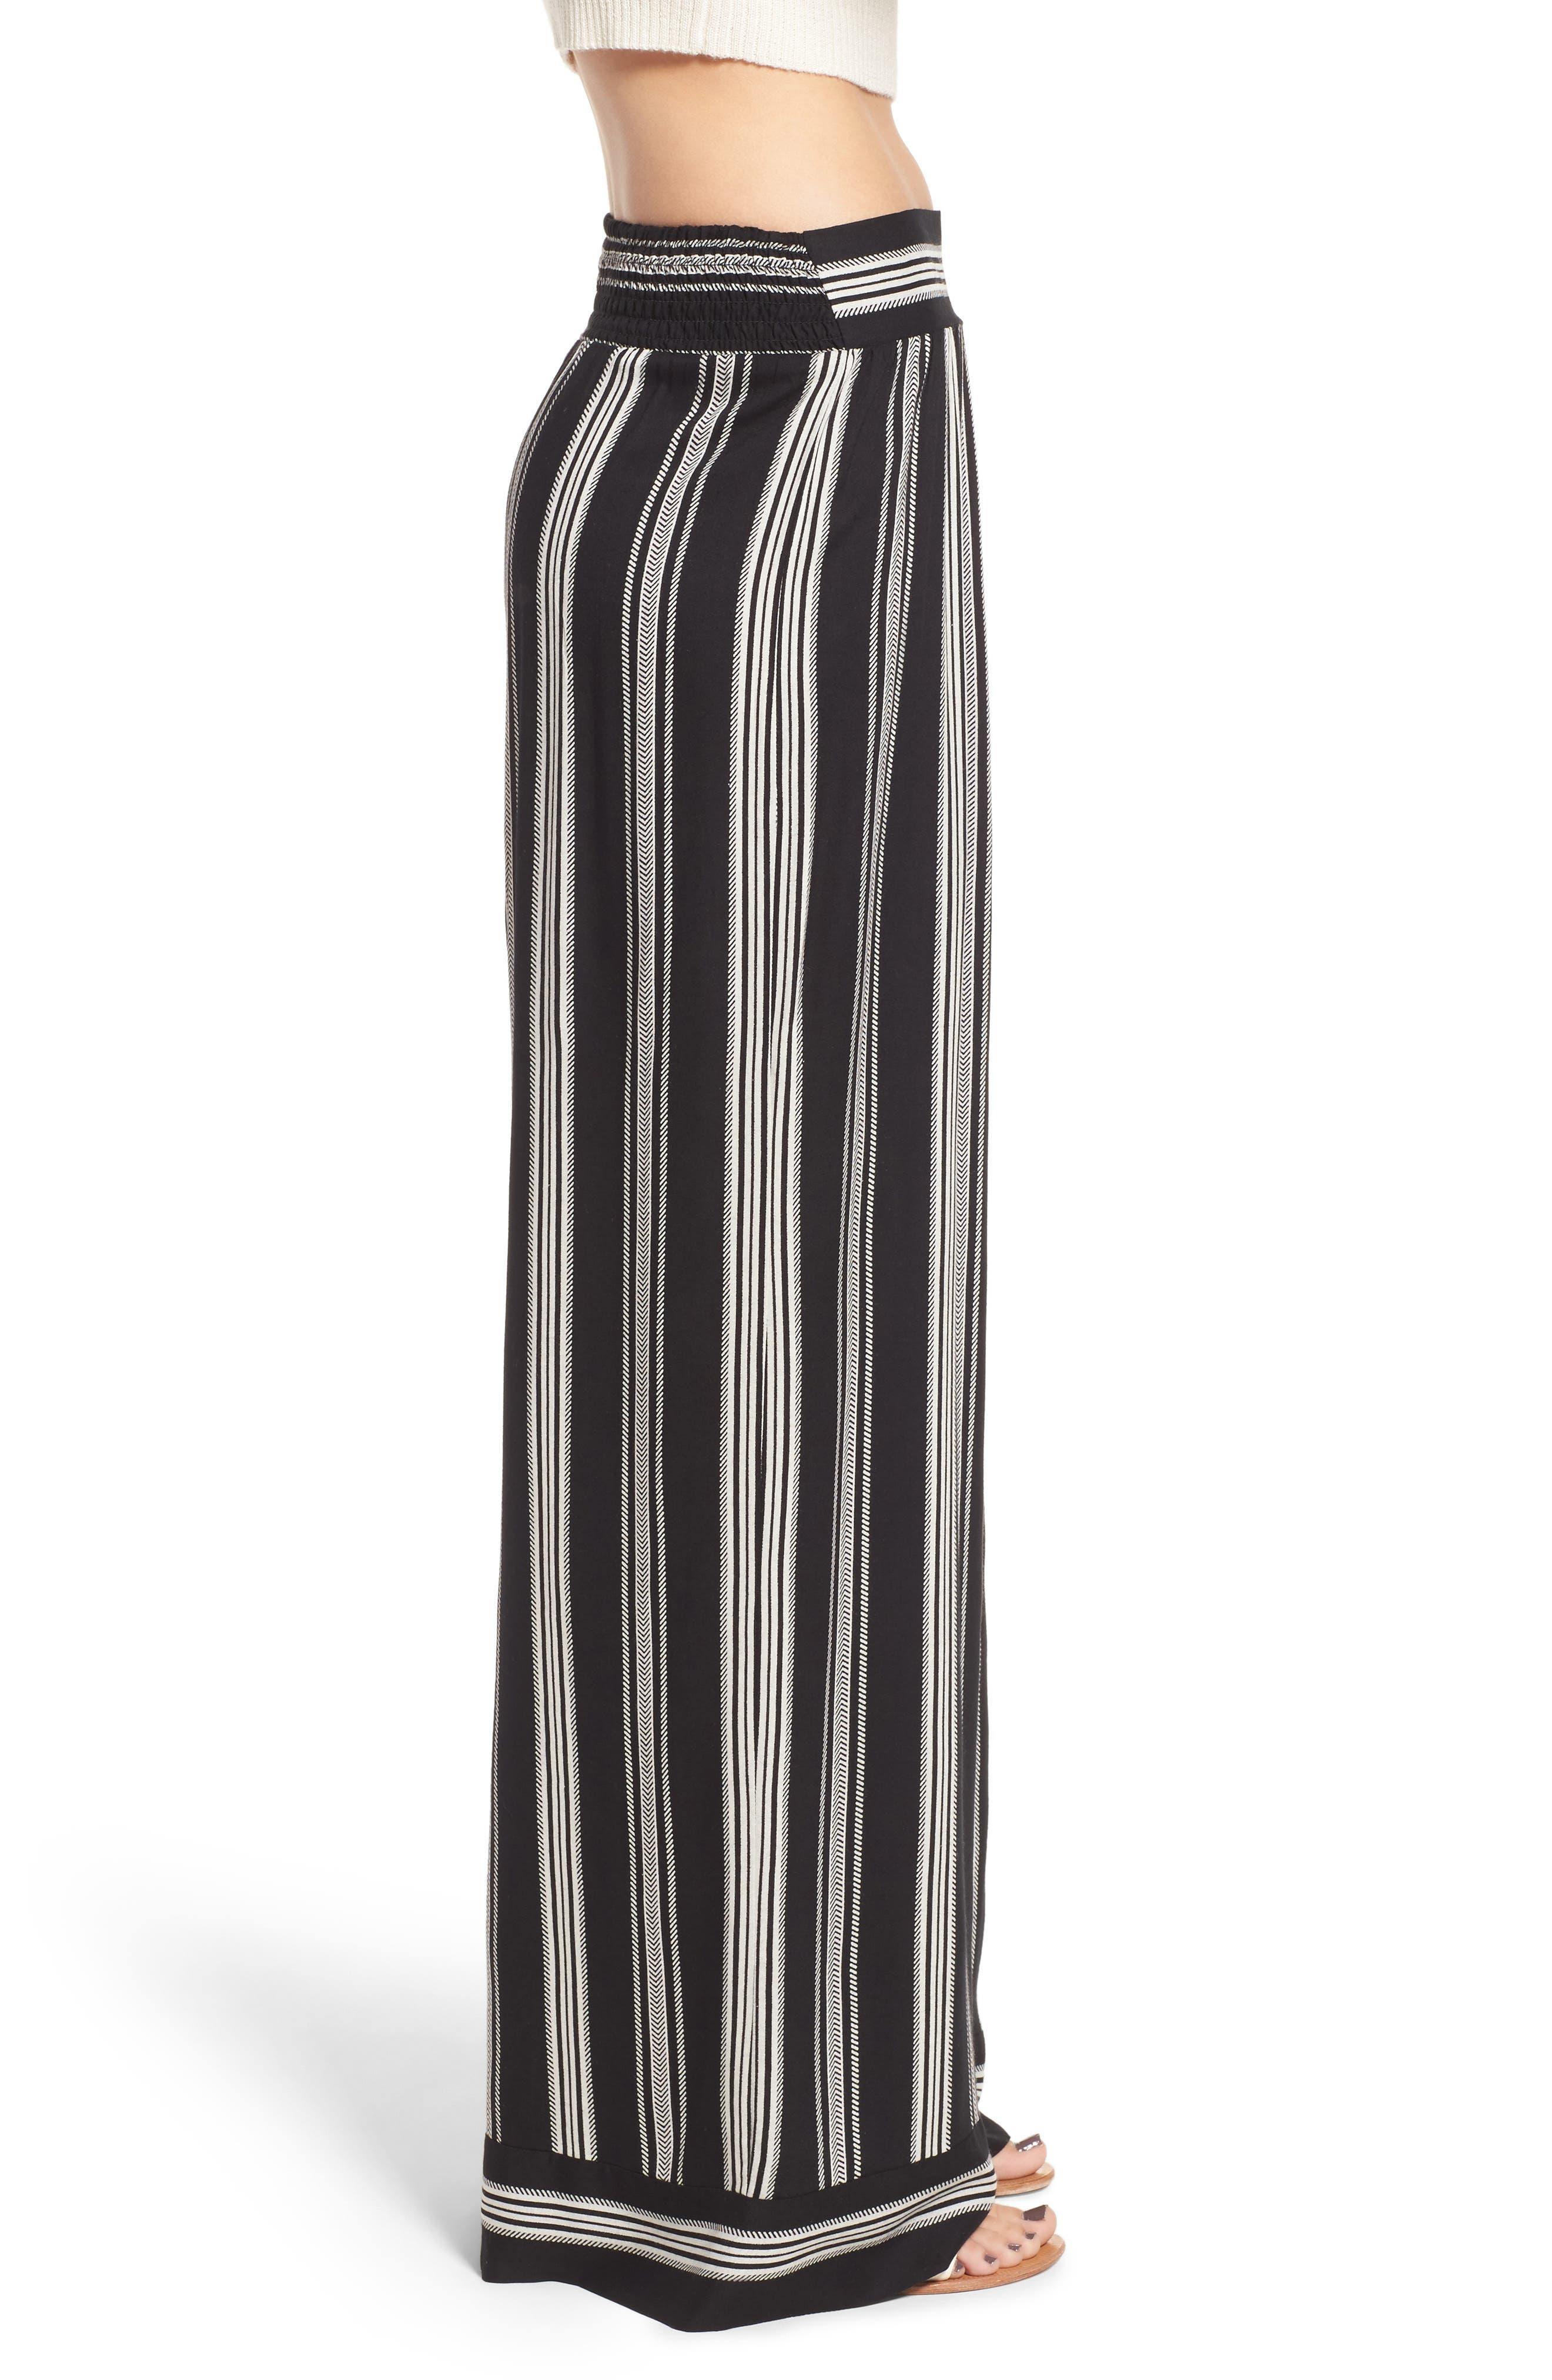 Herringbone Wide Leg Pants,                             Alternate thumbnail 3, color,                             887R-Black/ Ivory